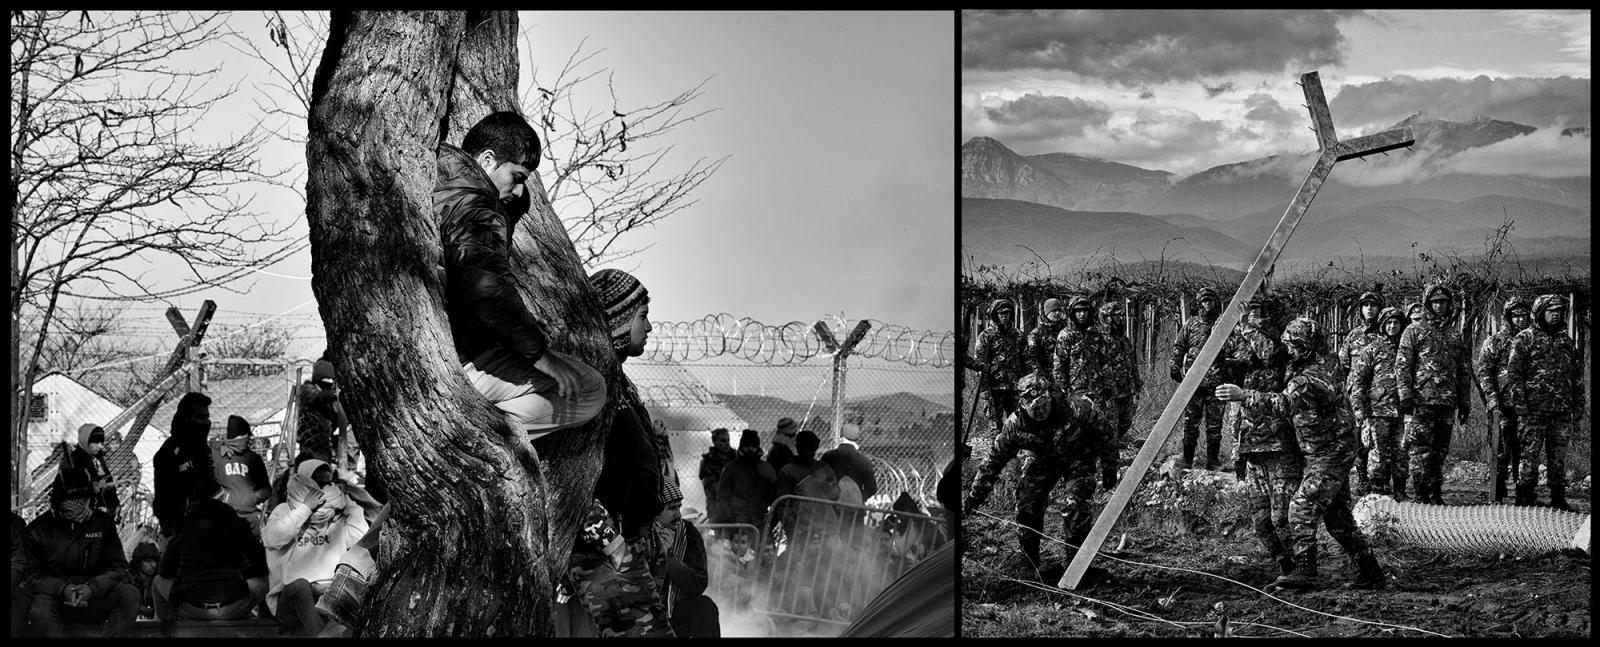 Art and Documentary Photography - Loading Nikos_Pilos_Stern_Goethe_institute_016.jpg